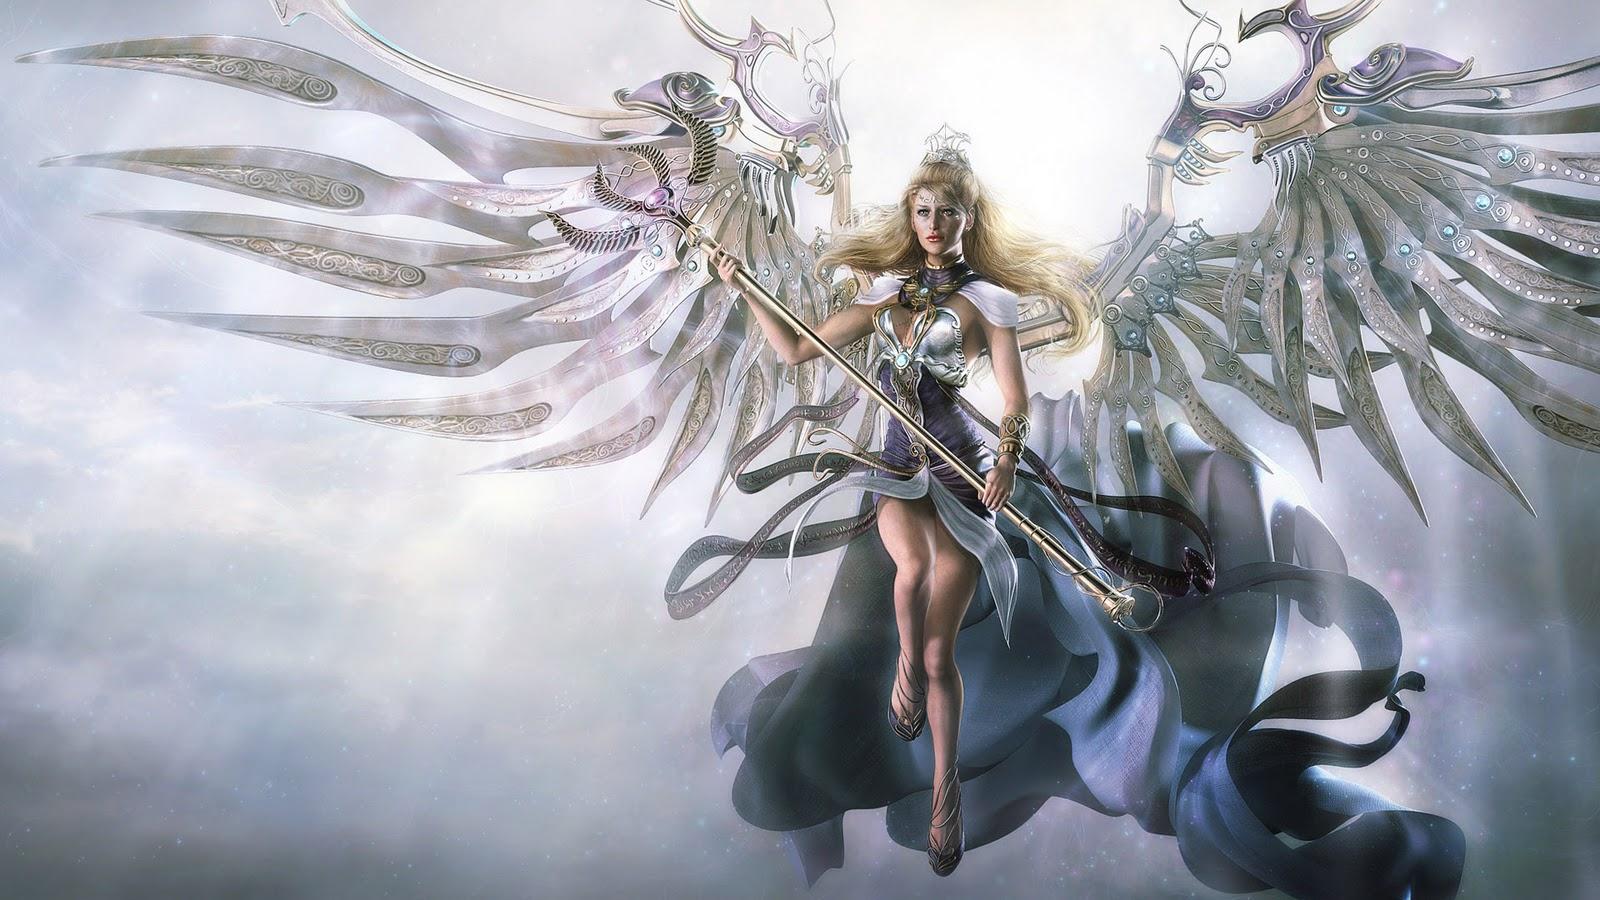 Fantasy Wallpapers Hd Angel Fantasy Wallpapers Hd